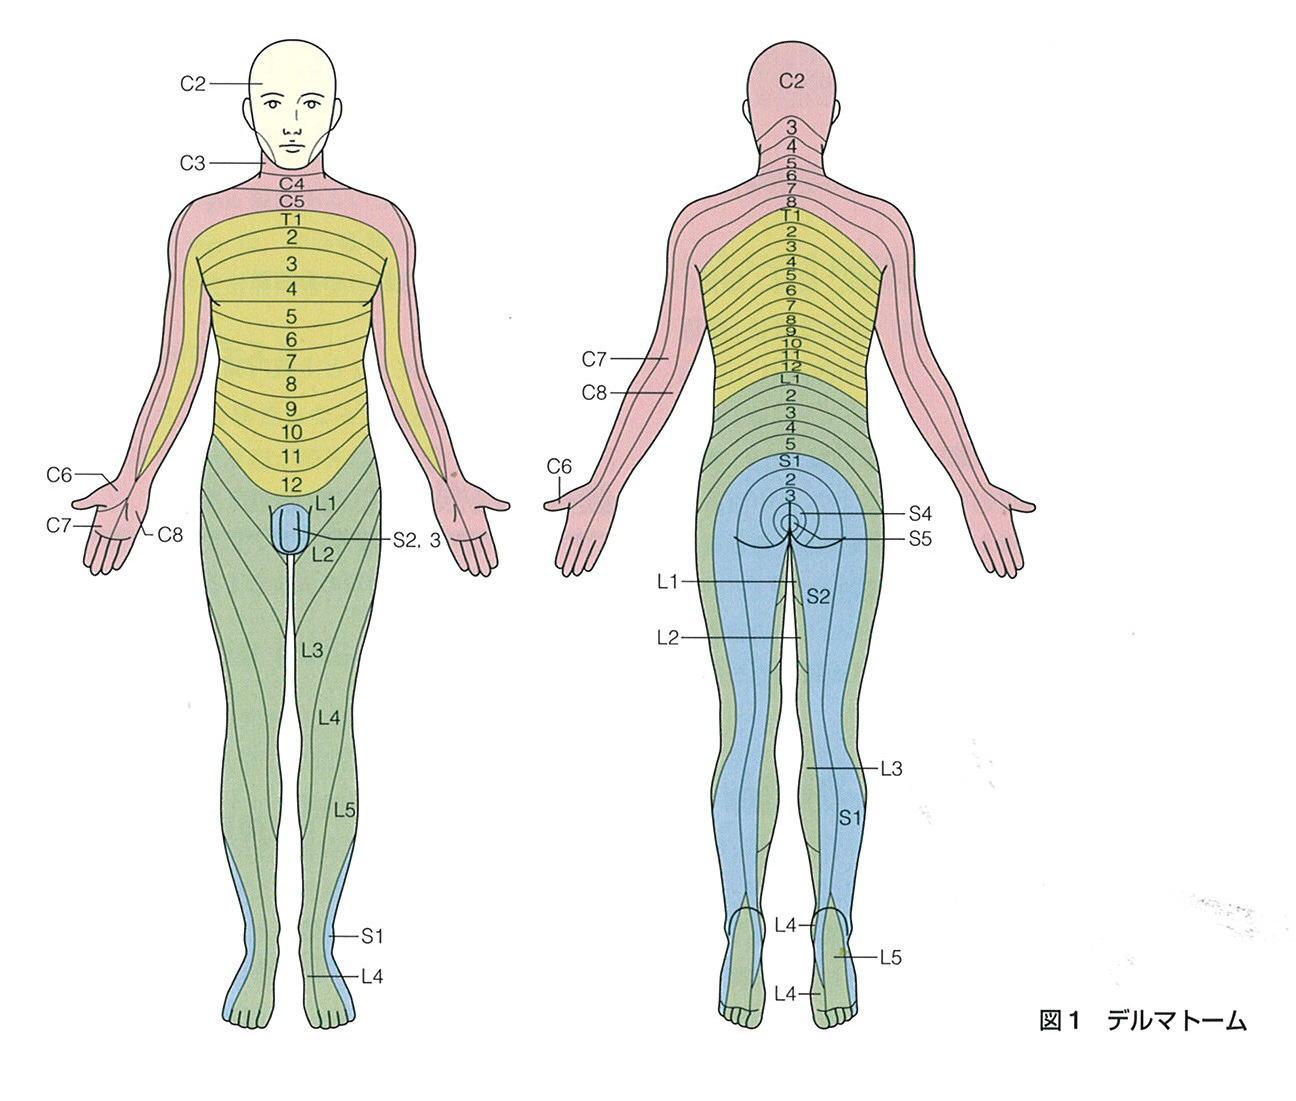 dermatome デルマトーム 皮膚分節